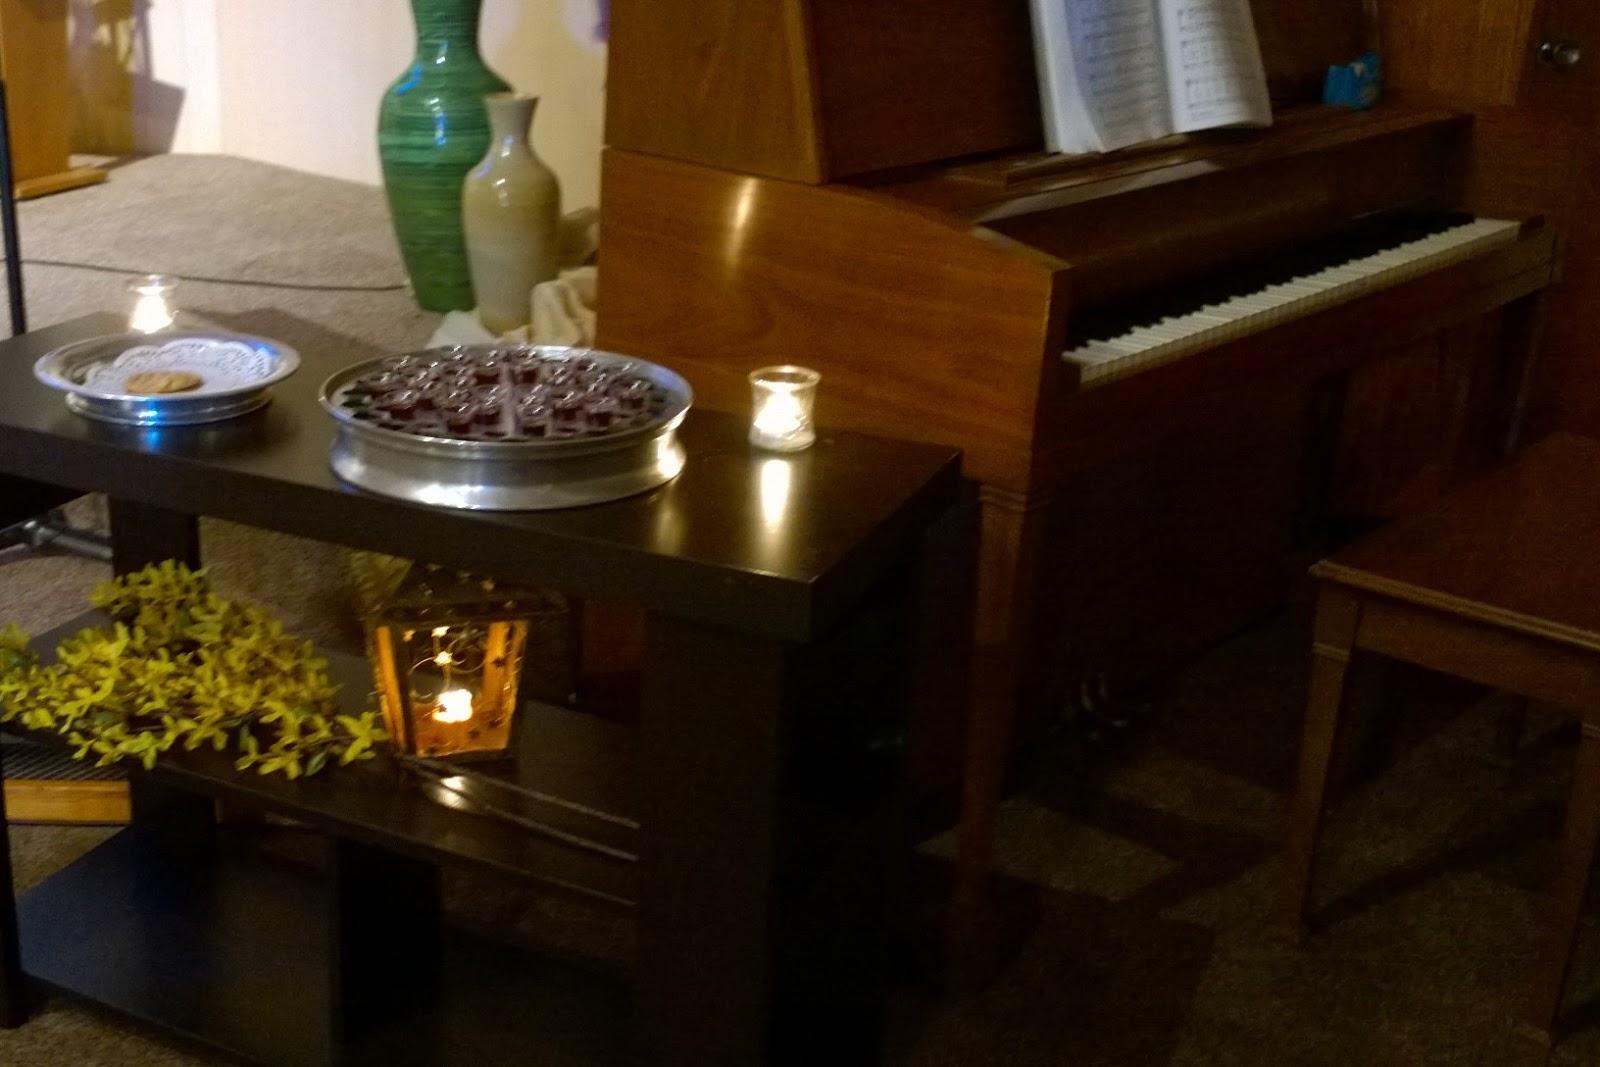 communion passage in bible